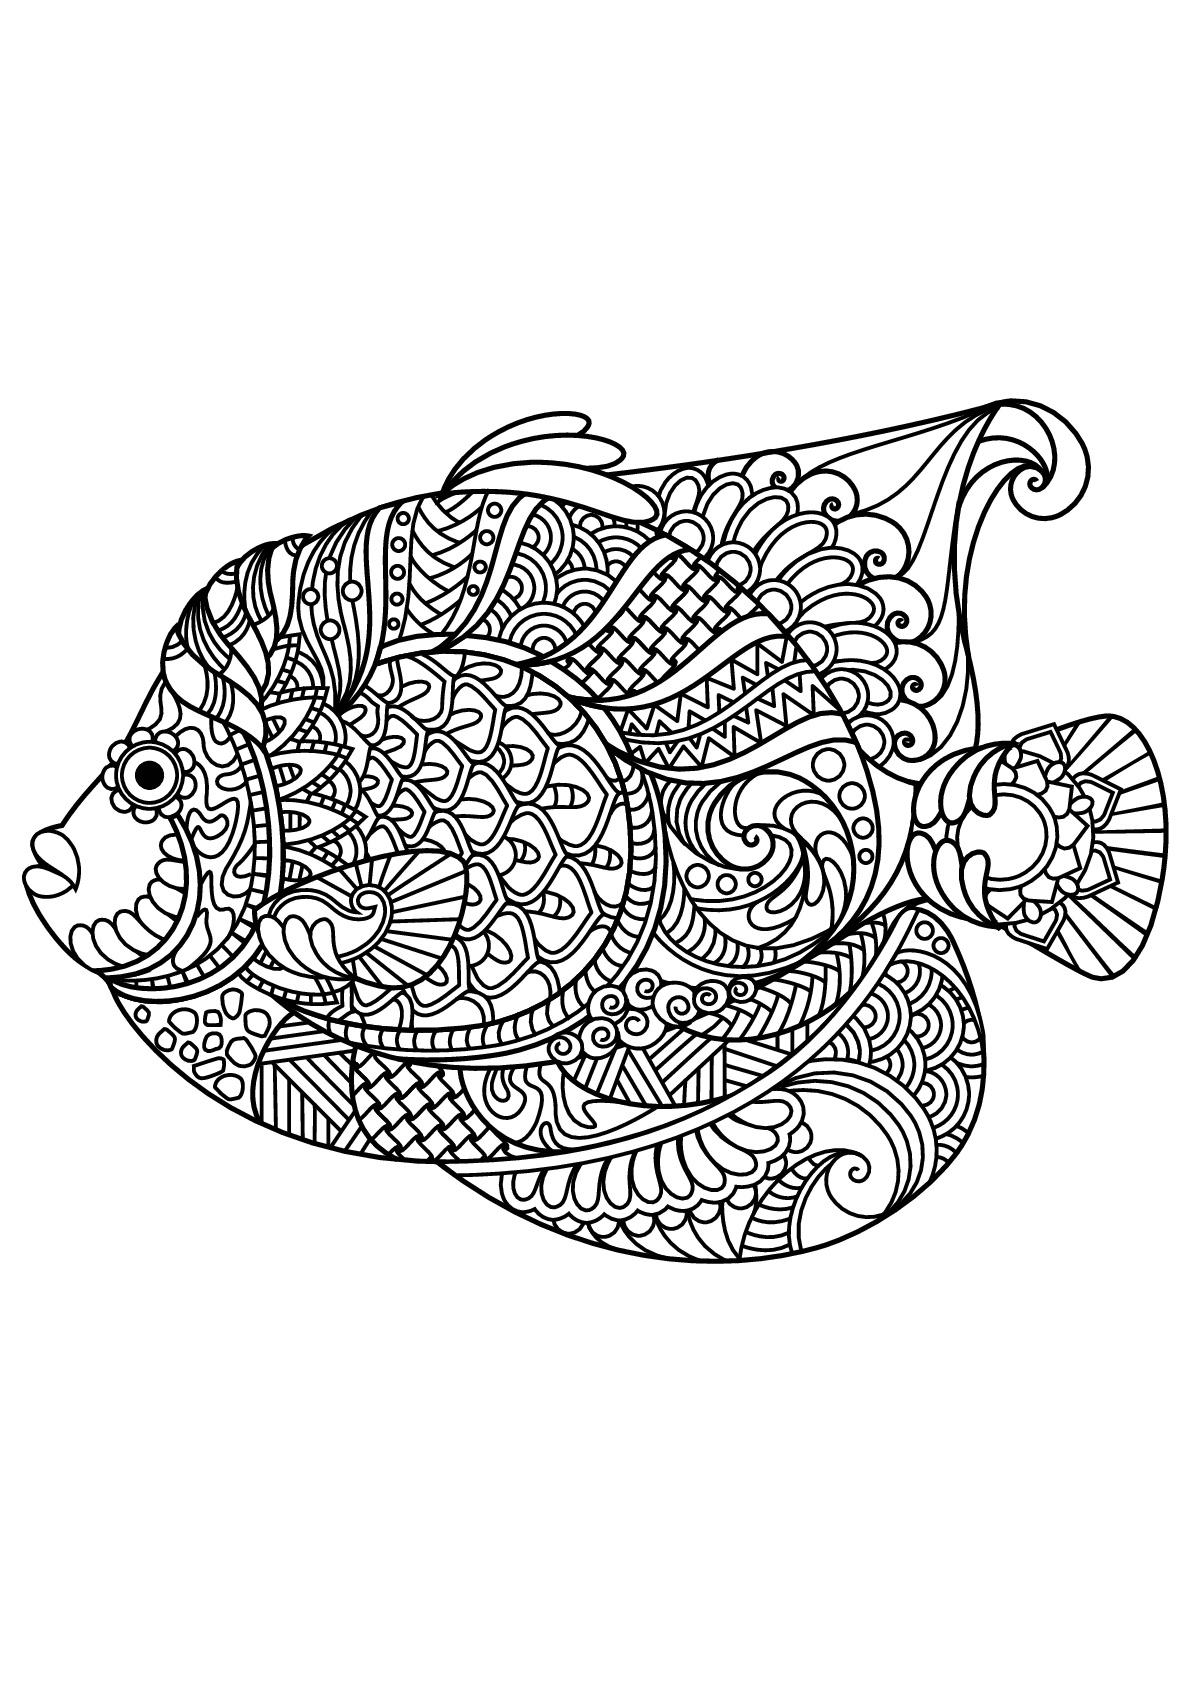 Pesci 94829 pesci disegni da colorare per adulti for Immagini di pesci da stampare